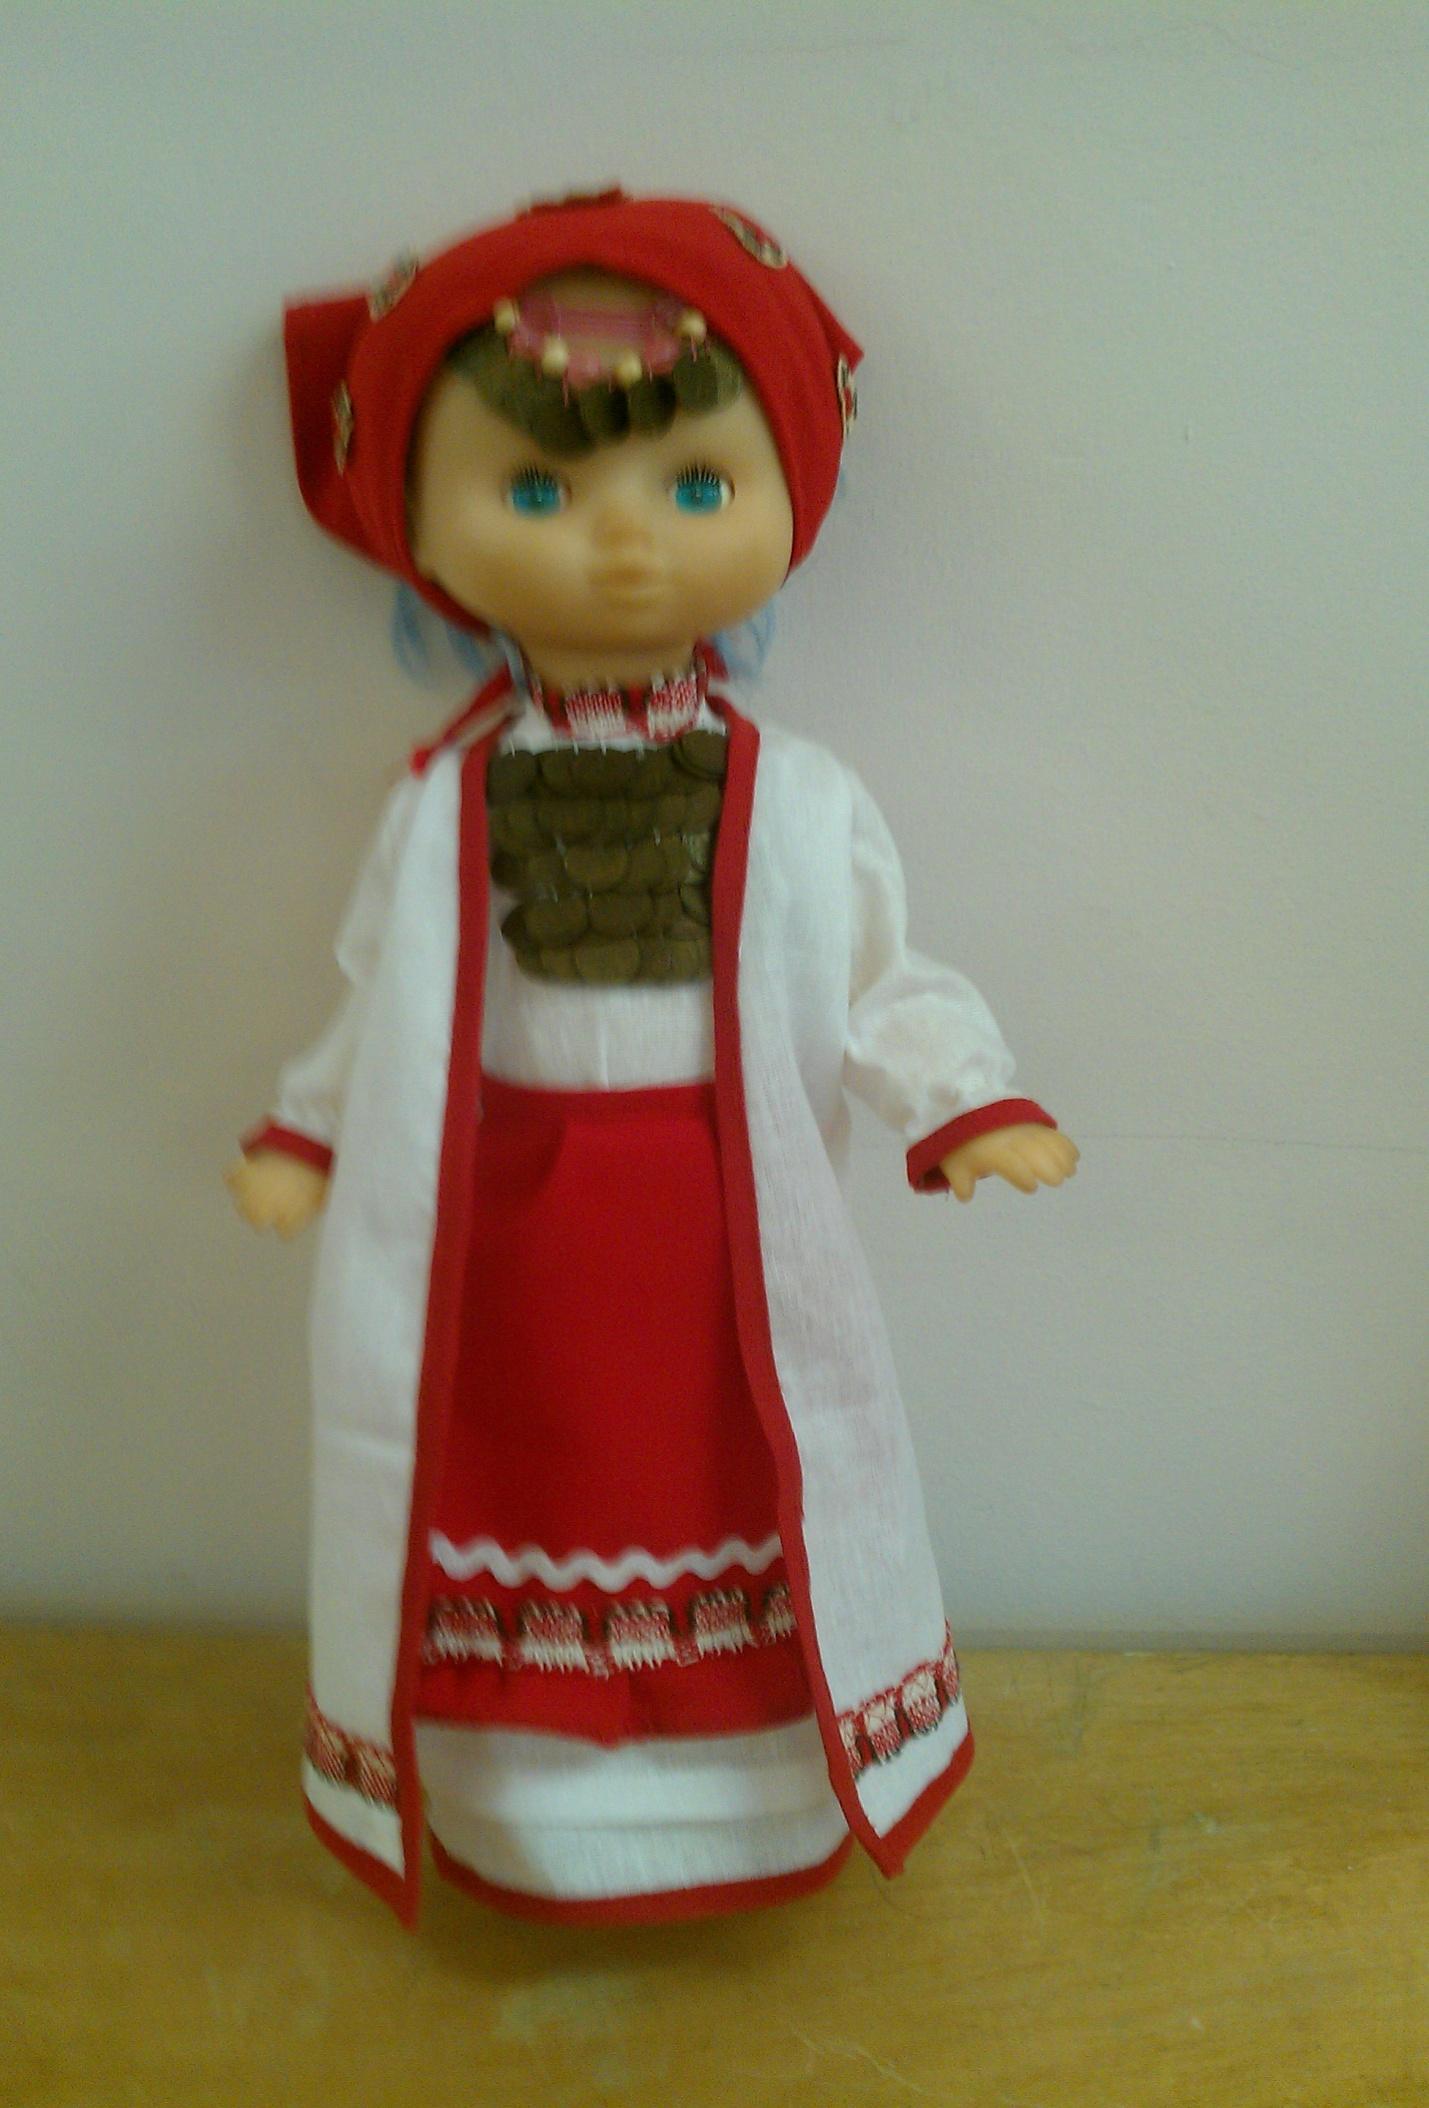 C:\Users\PC\Documents\Моя малая родина 2014\куклы\IMAG2592.jpg